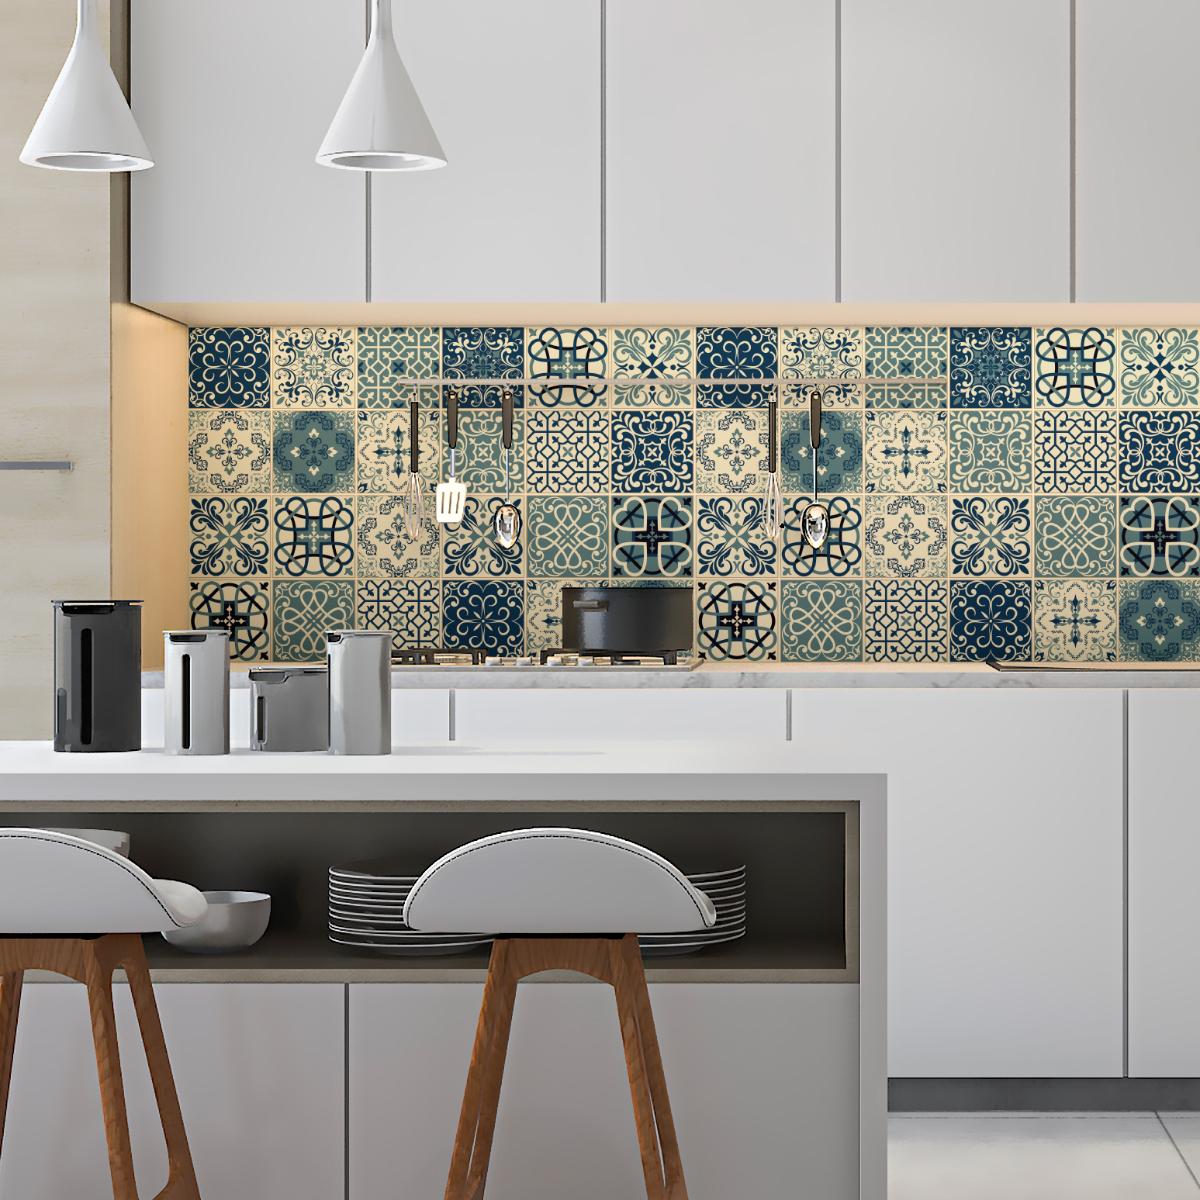 24 stickers carrelages azulejos salvador salle de bain et wc salle de bain ambiance sticker. Black Bedroom Furniture Sets. Home Design Ideas